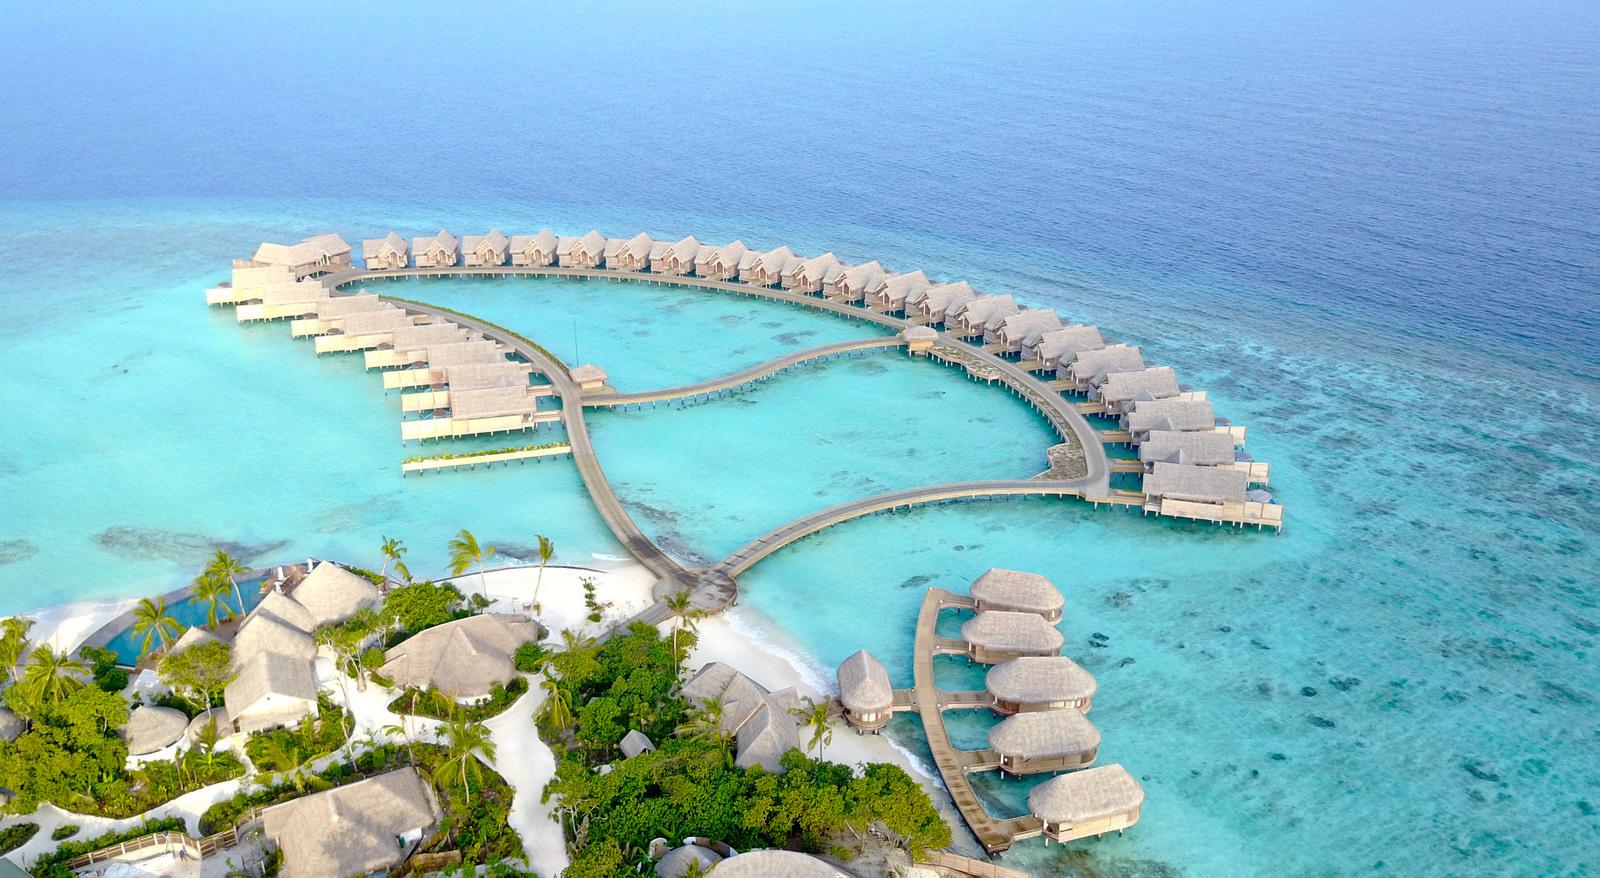 Malediven    die neue Trauminsel Milaidhoo im Baa Atoll strand sonne reisebericht malediven honeymoon 2  TUI Berlin Reisebüro Malediven Milaidhoo Island Watervillas